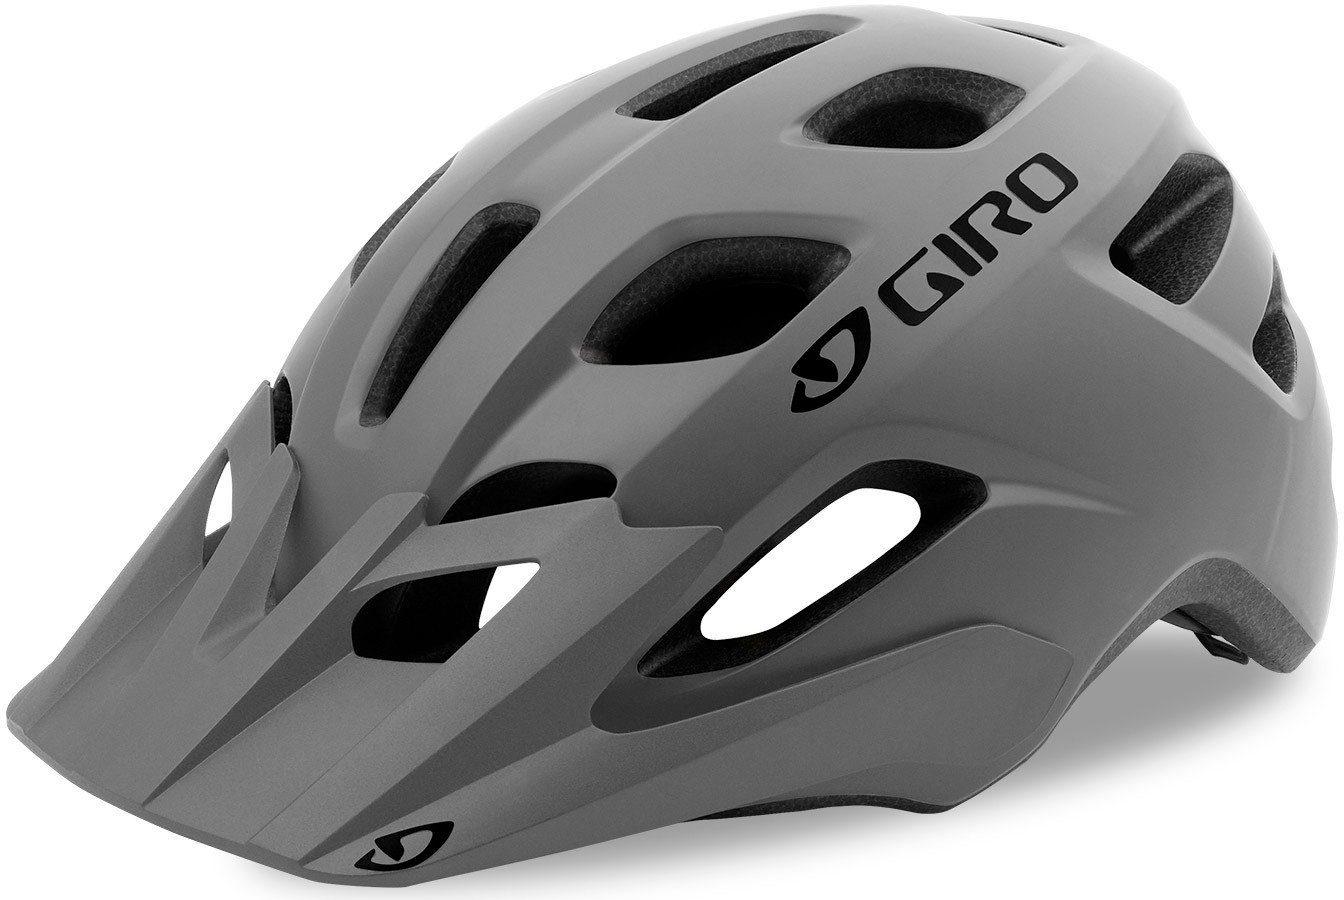 Giro Fahrradhelm »Compound MIPS Helmet« kaufen | OTTO